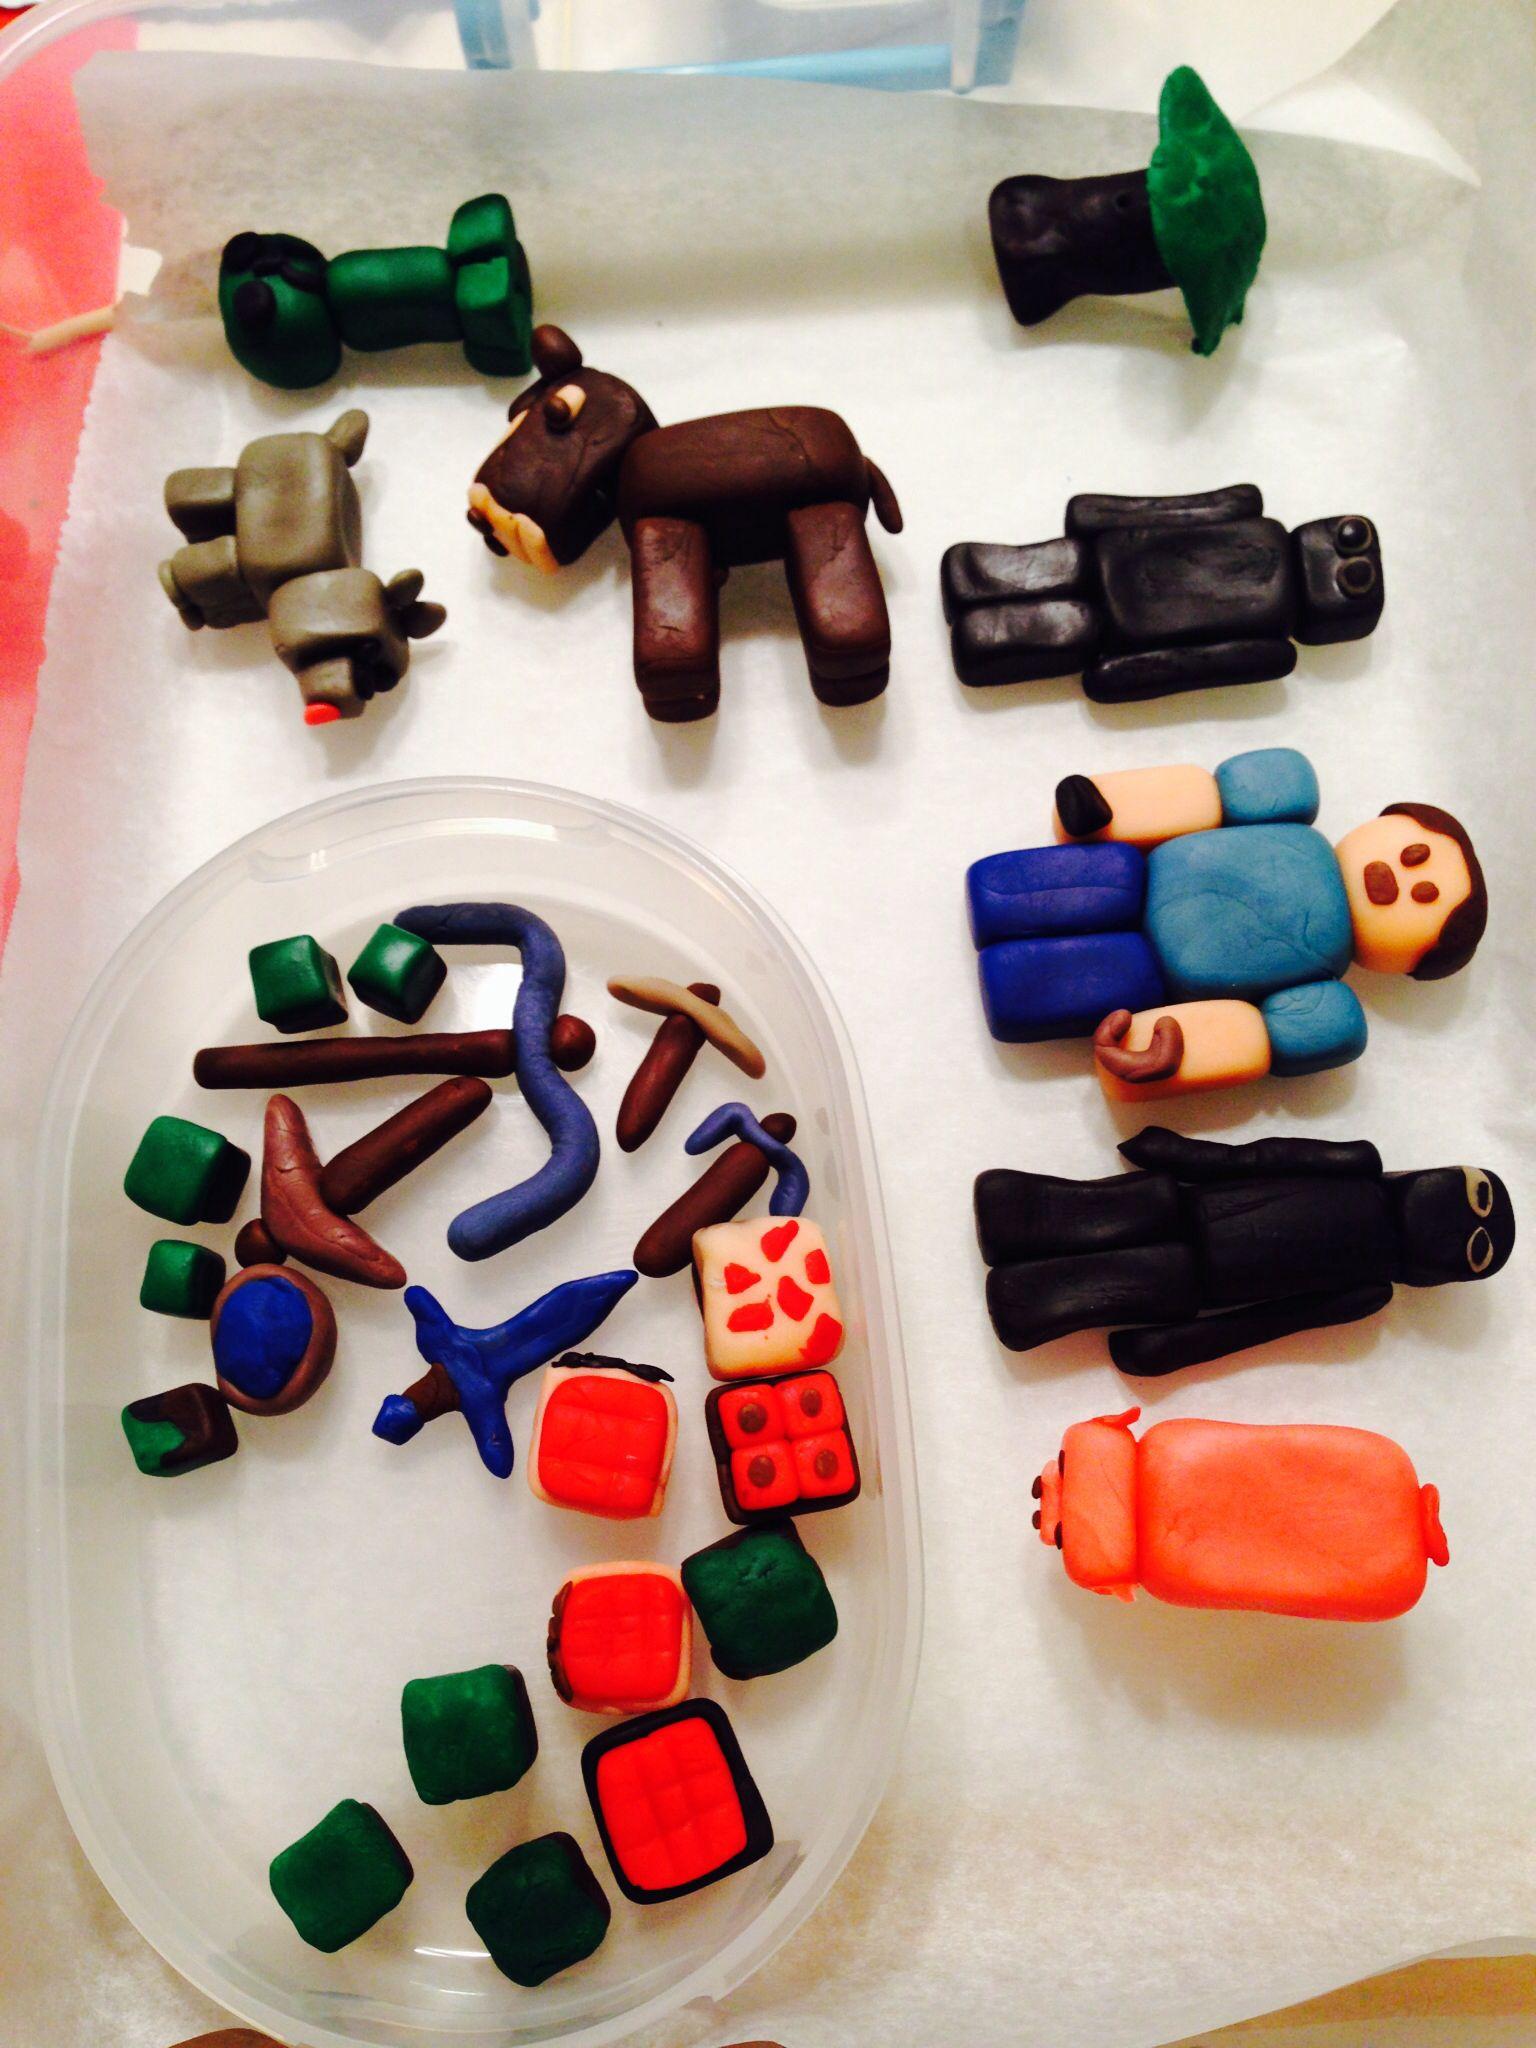 Minecraft figures made of edible molding dough for Salt dough crafts figures